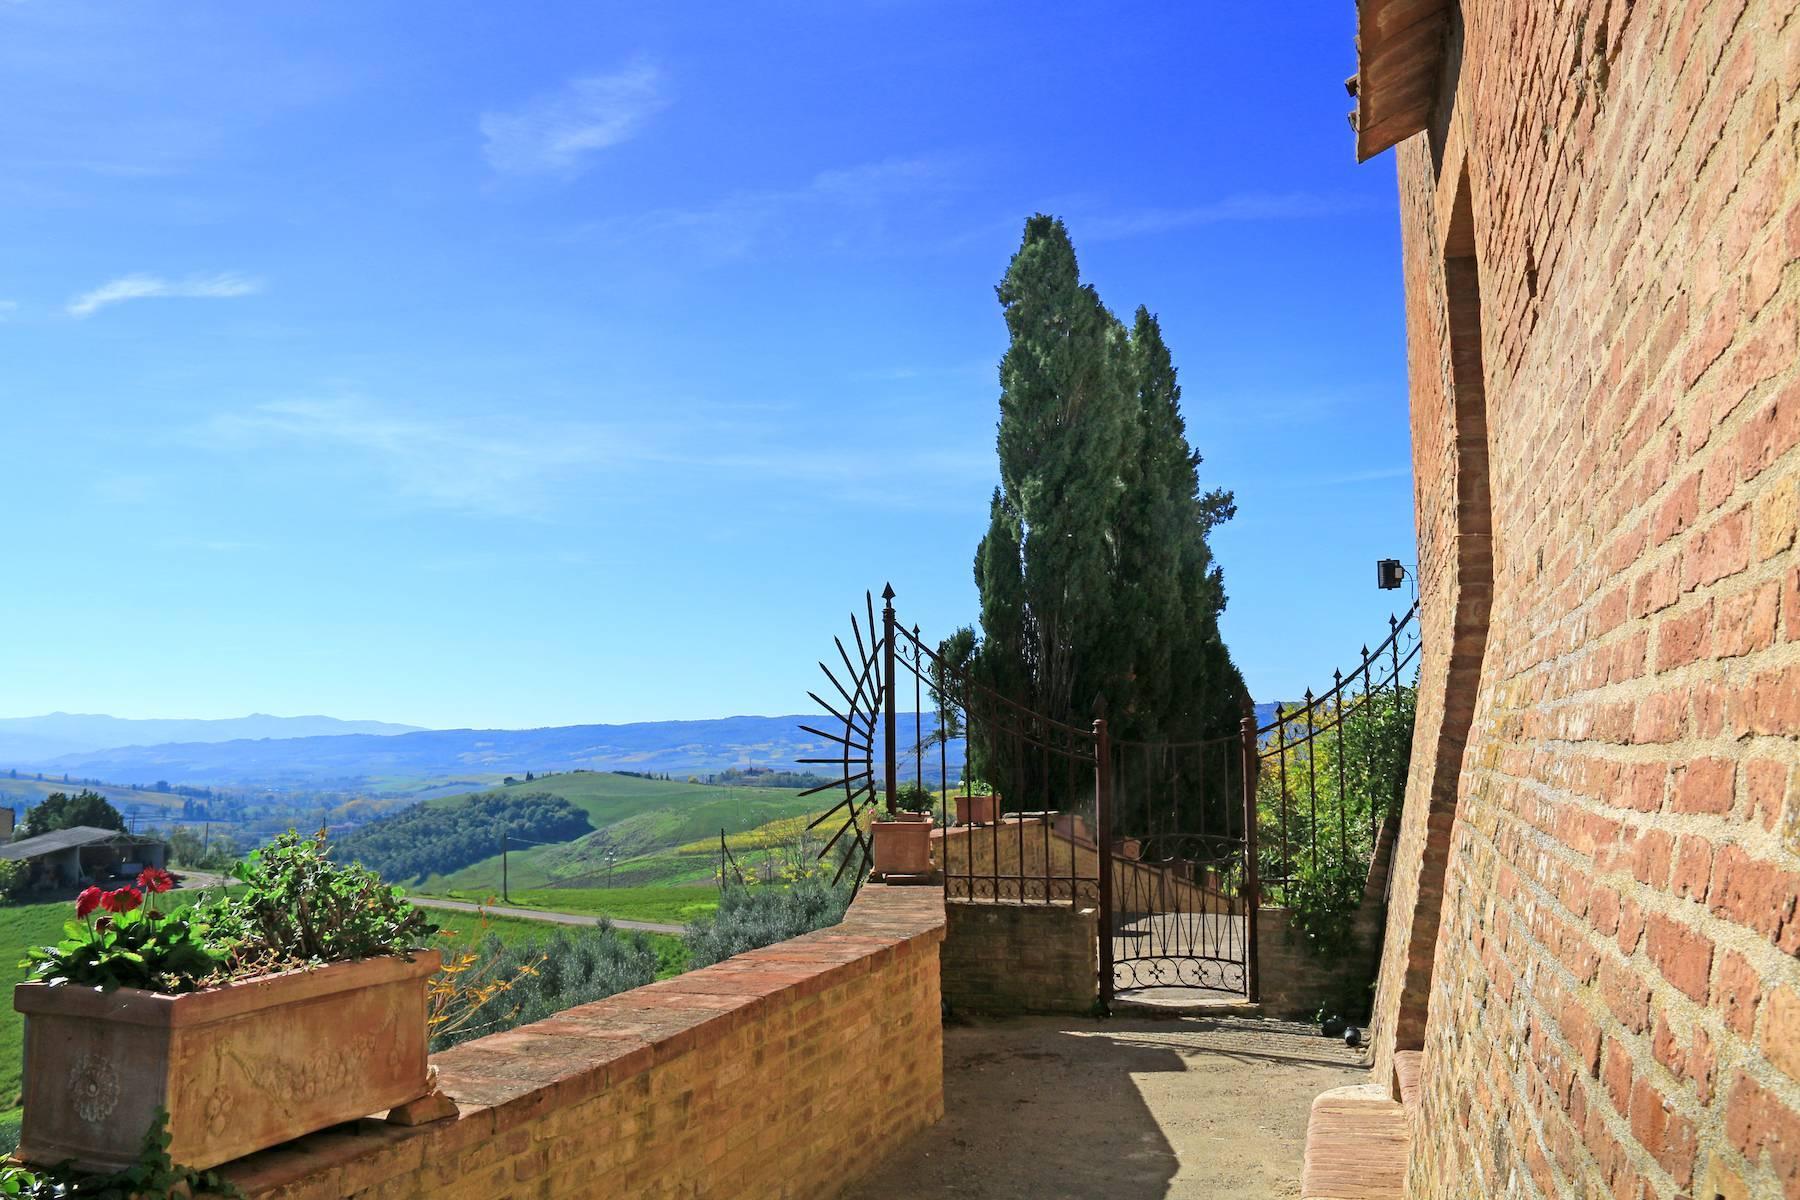 Wunderschönes Schloss im Herzen der Toskana - 4